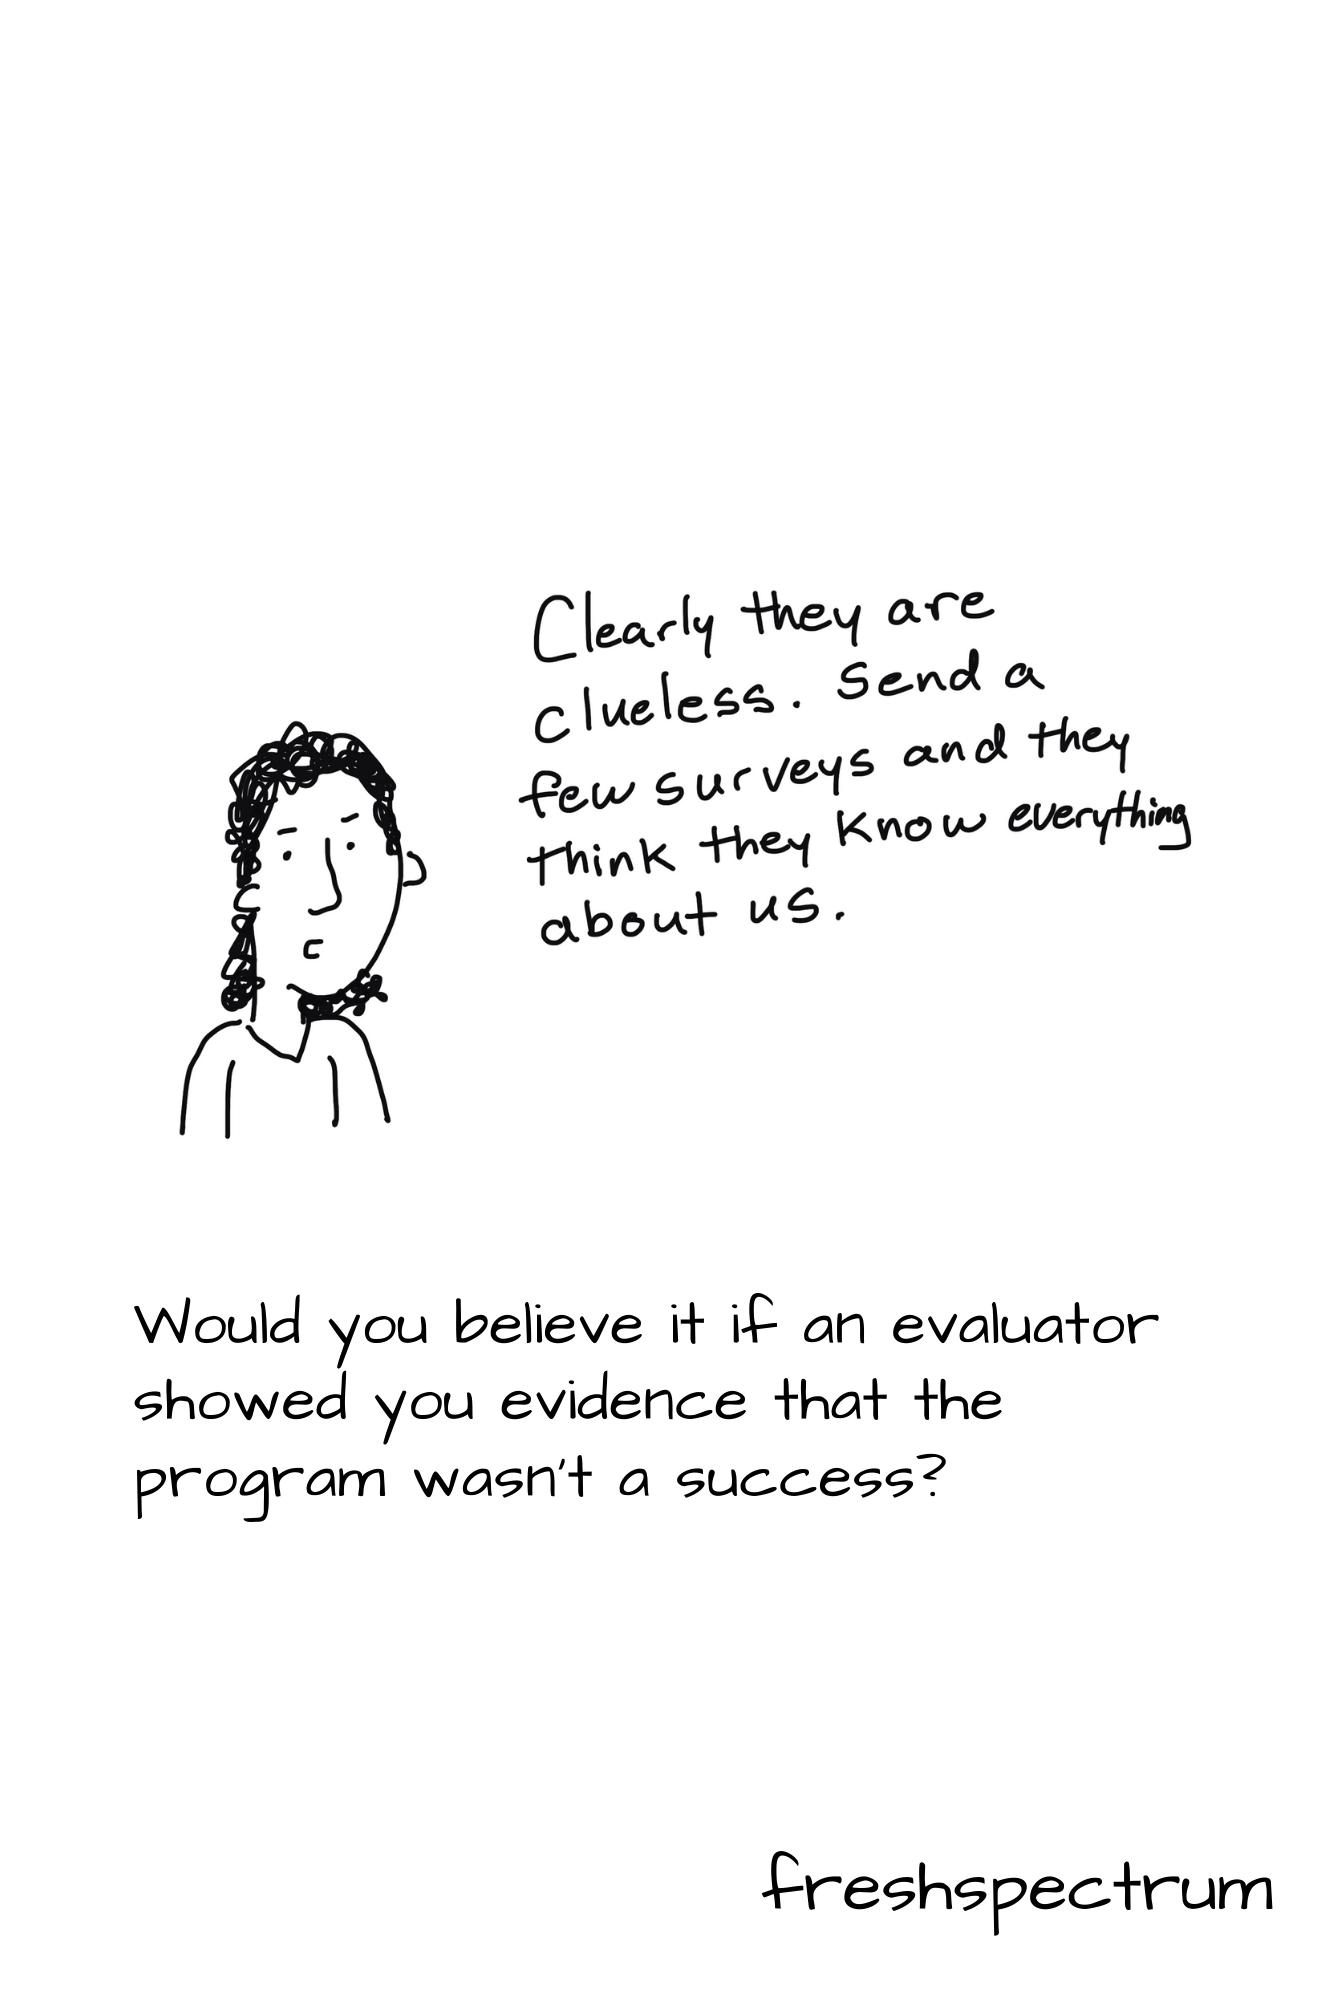 Shrodinger's Outcome Graphic Novella by Chris Lysy of freshspectrum.com.  Illustration 10.